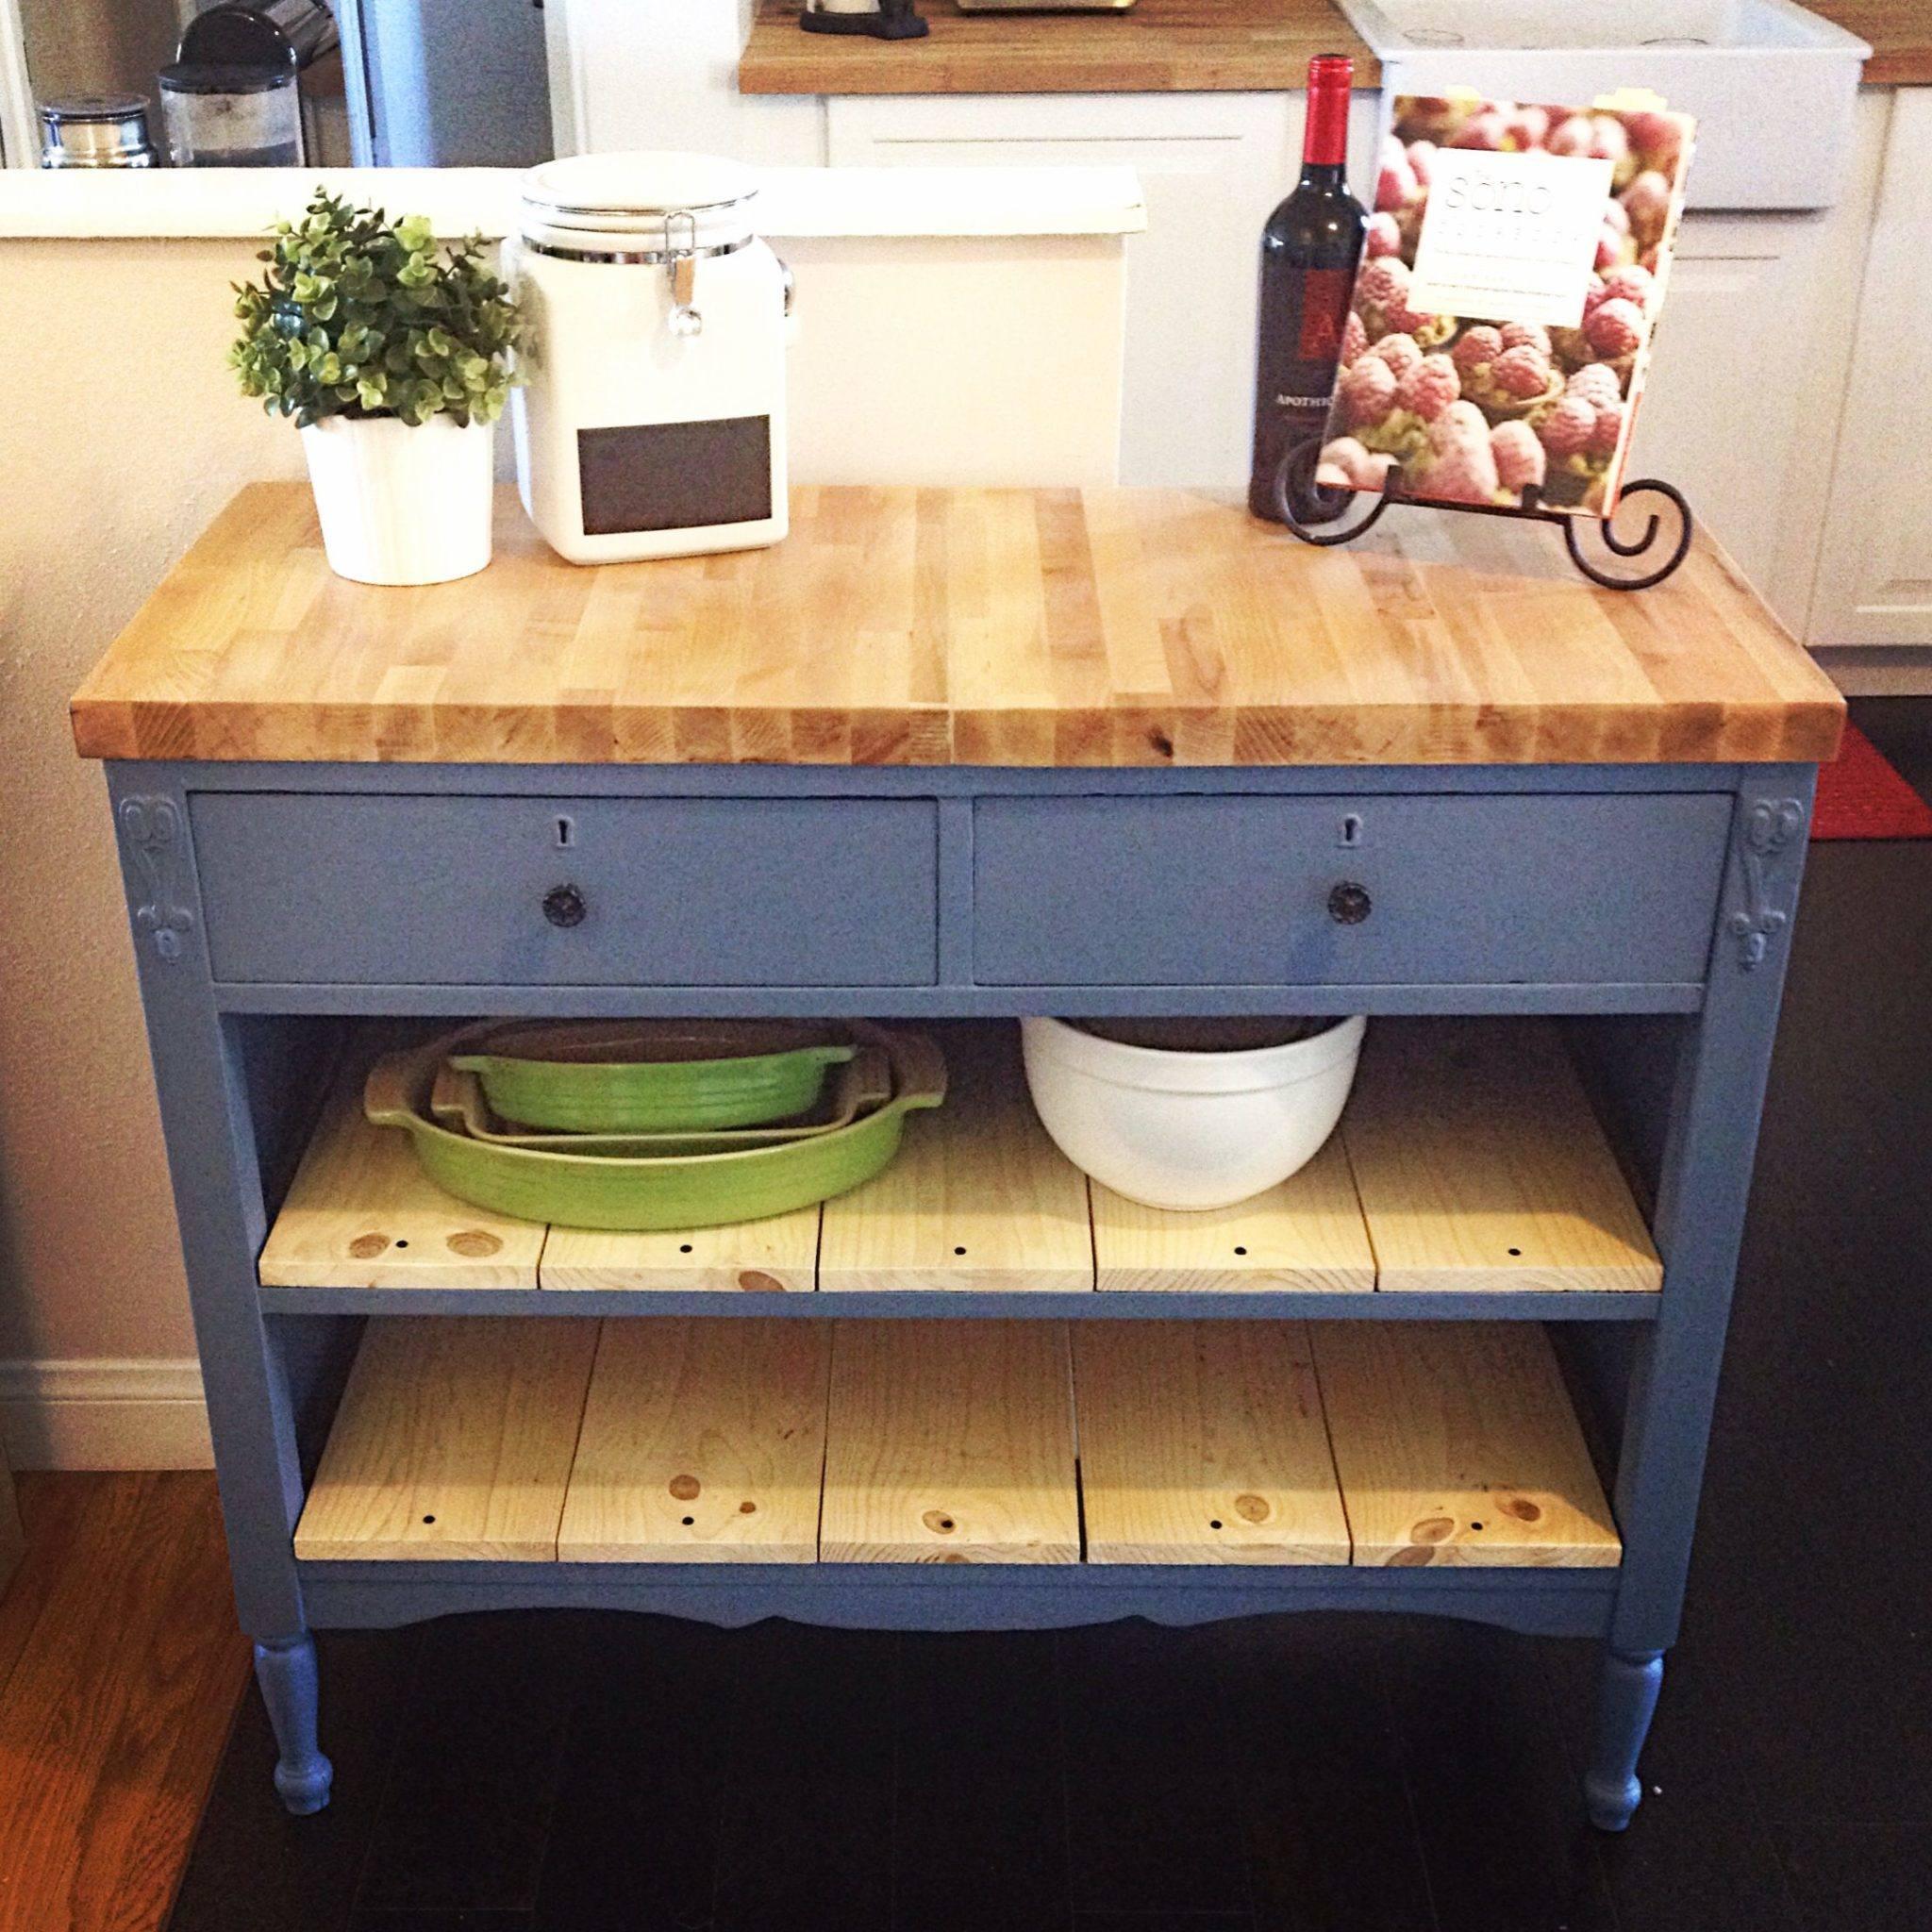 An Old Dresser Into A Kitchen Island